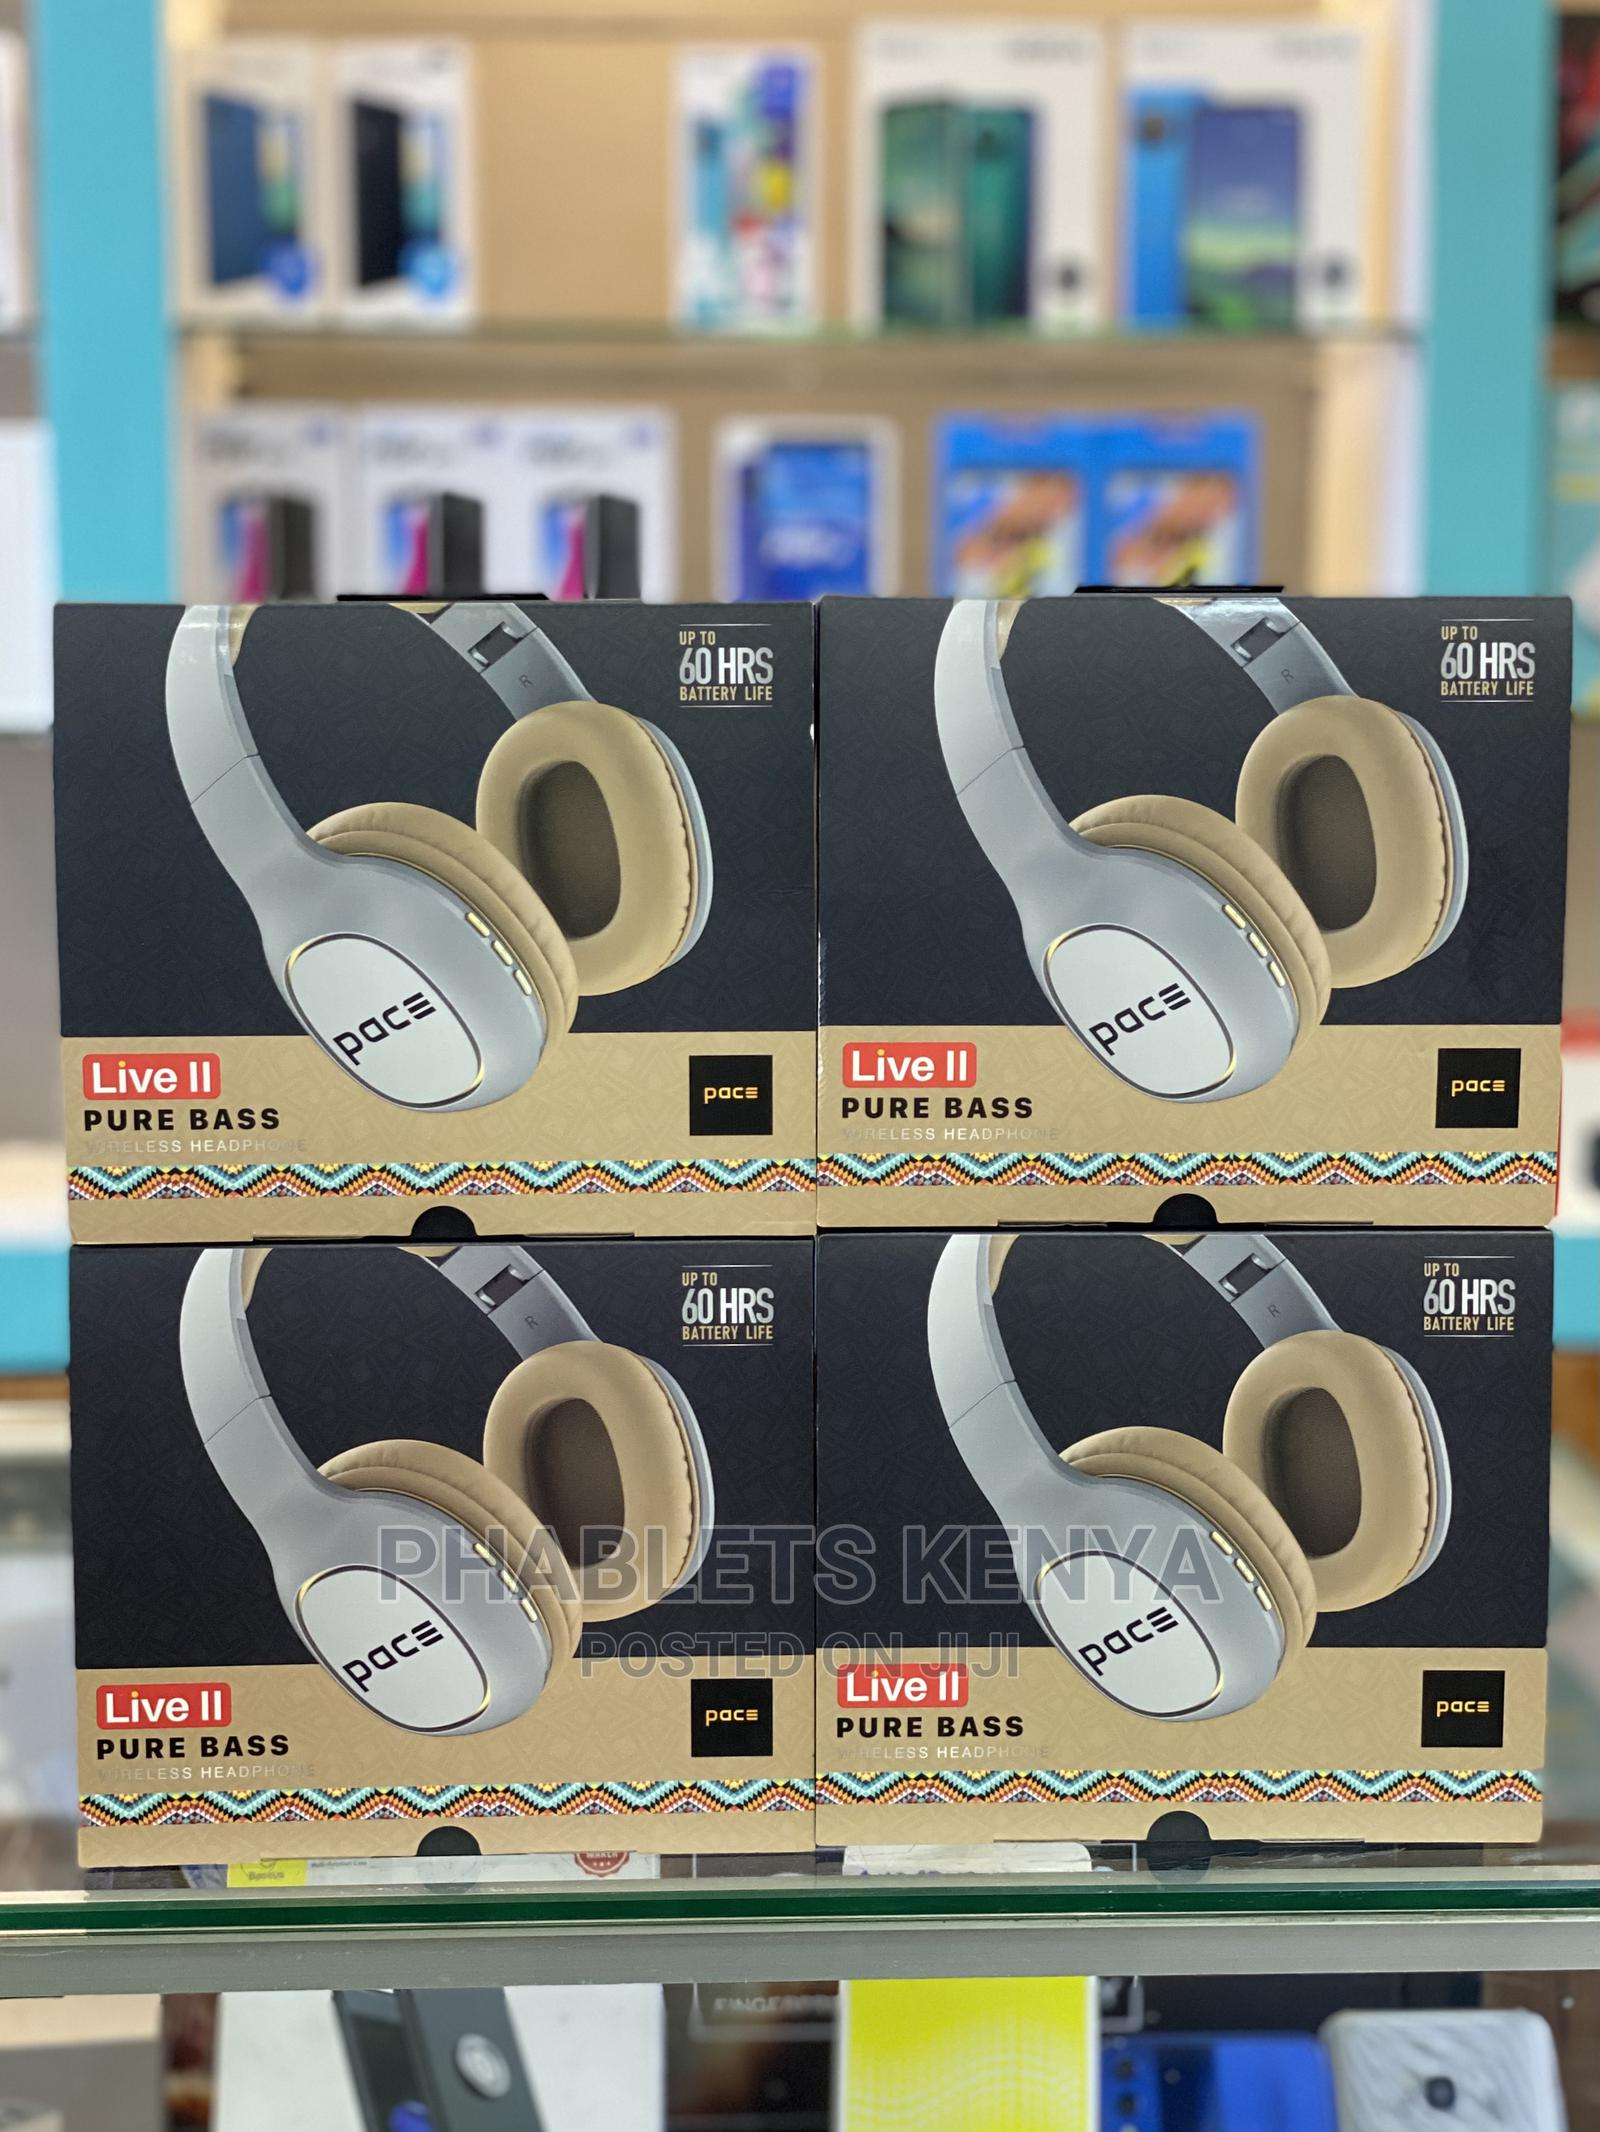 Pace Live II Wireless Bluetooth Headphones